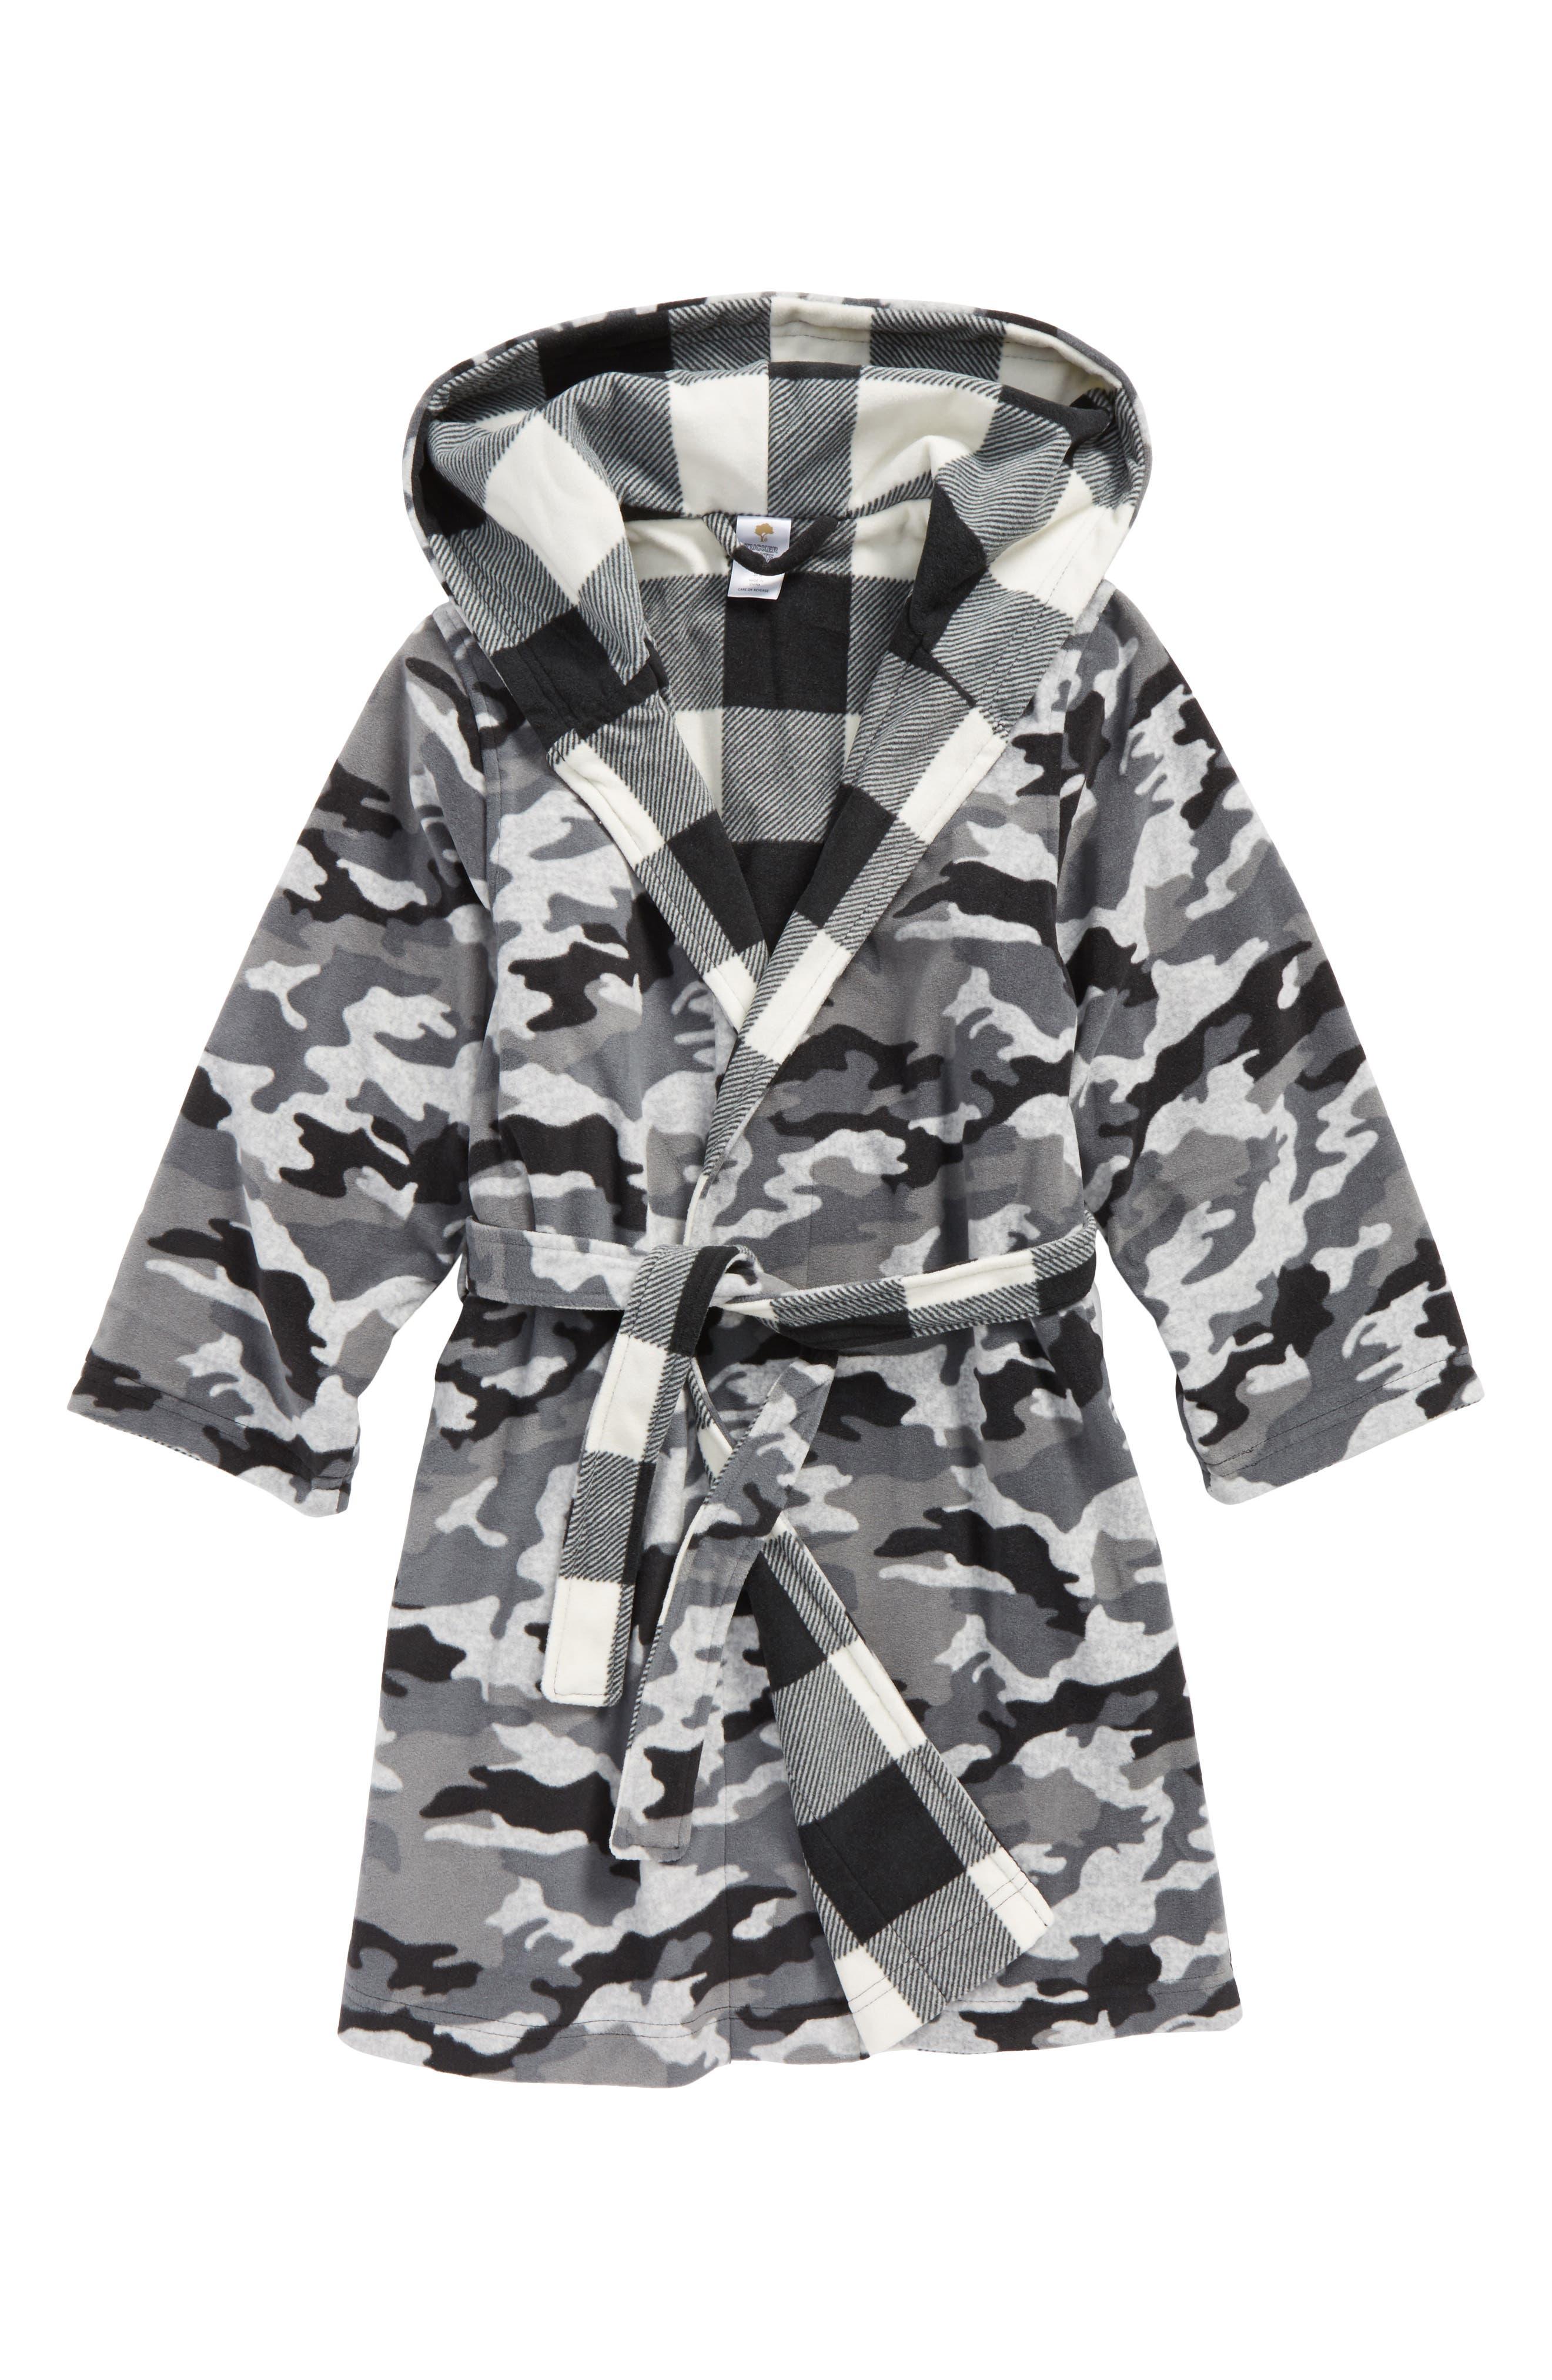 Boys Clothing Hoodies Shirts Pants T Nordstrom Tendencies Tops Jagger Olive L